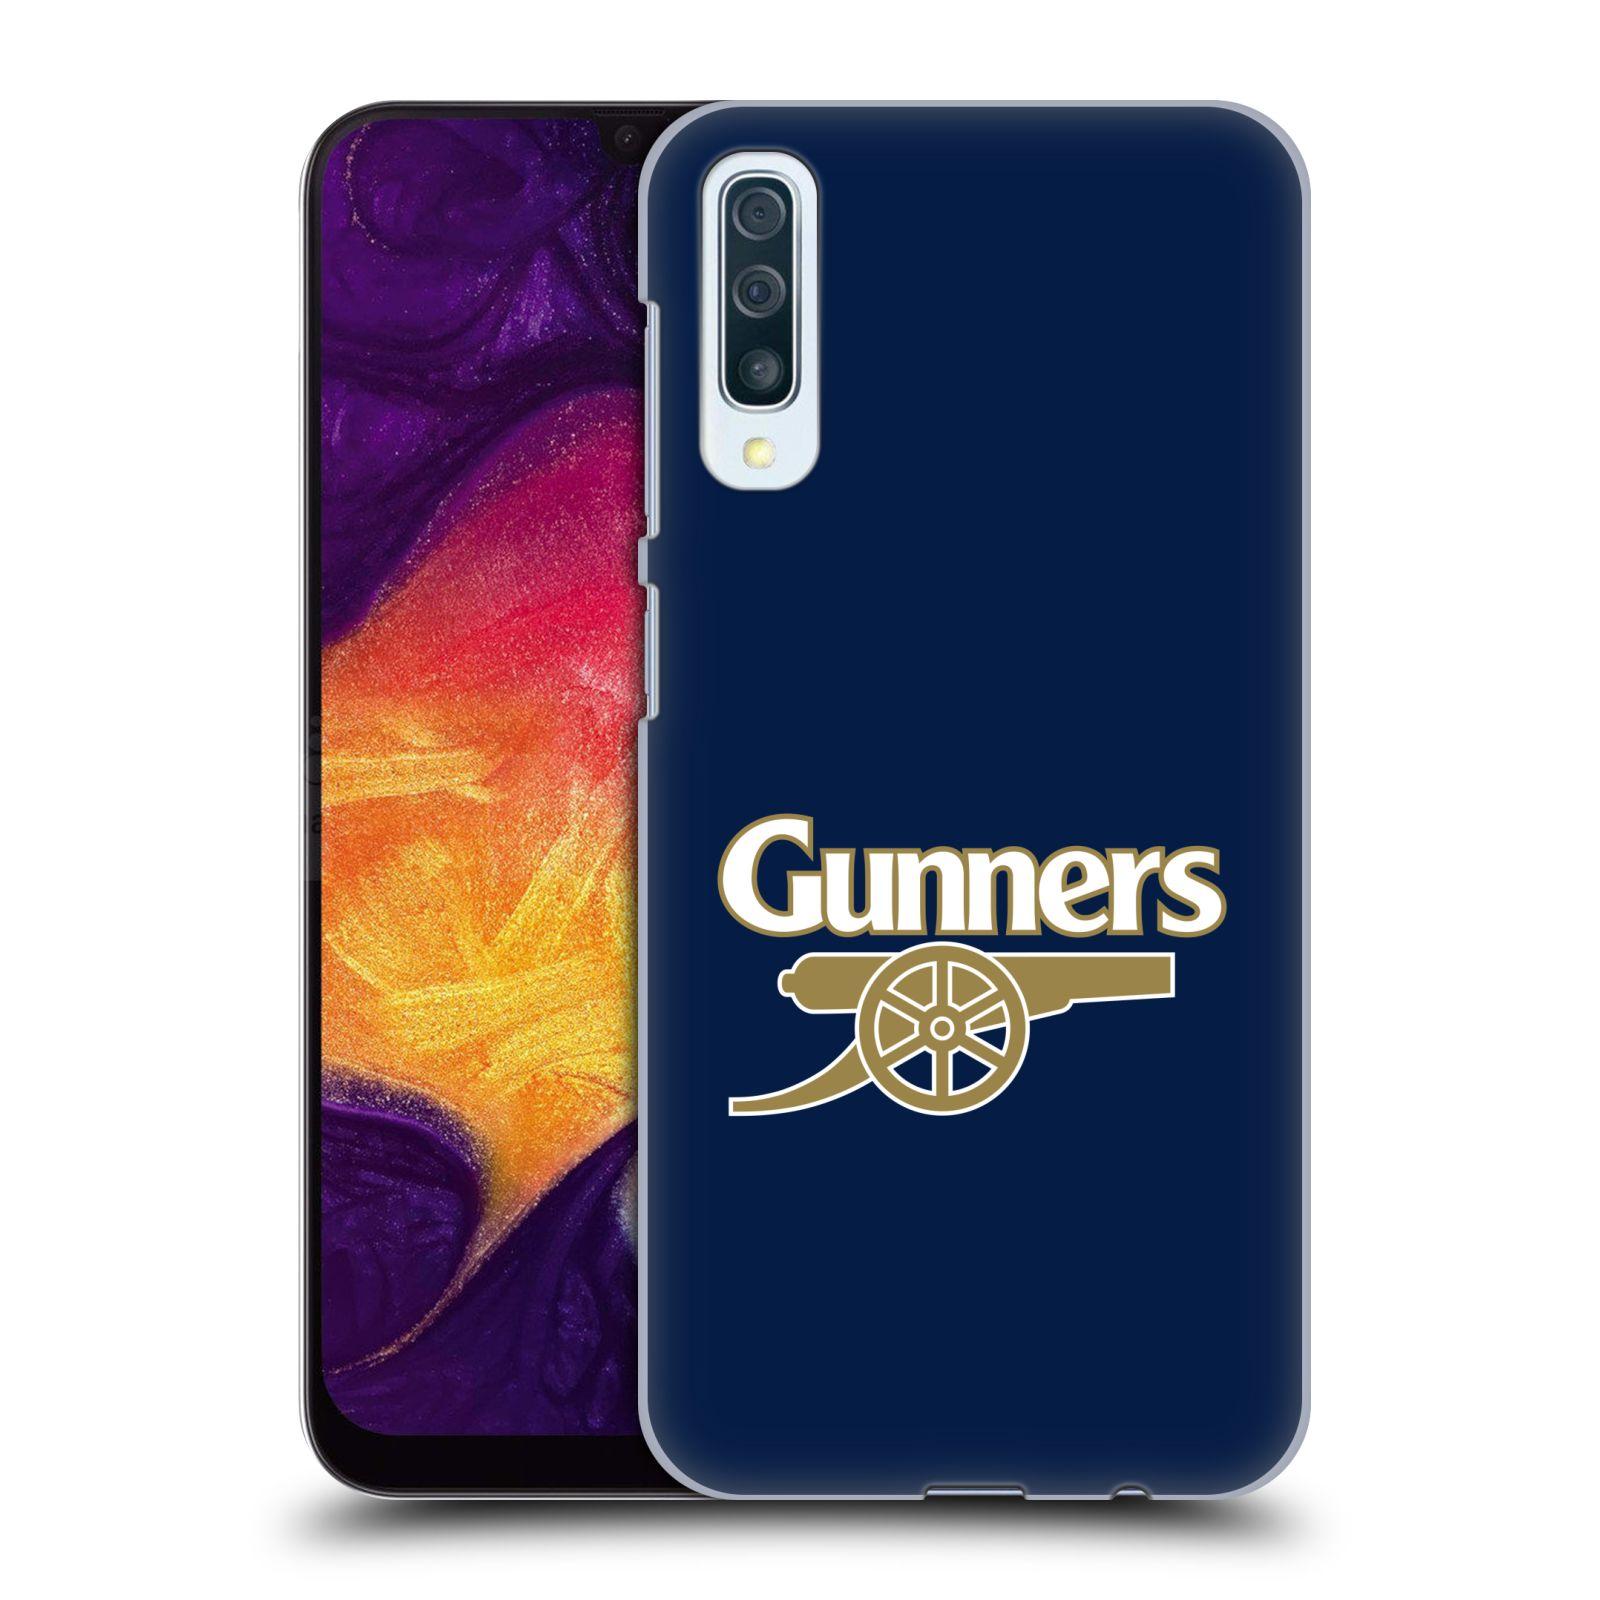 Plastové pouzdro na mobil Samsung Galaxy A50 - Head Case - Arsenal FC - Gunners